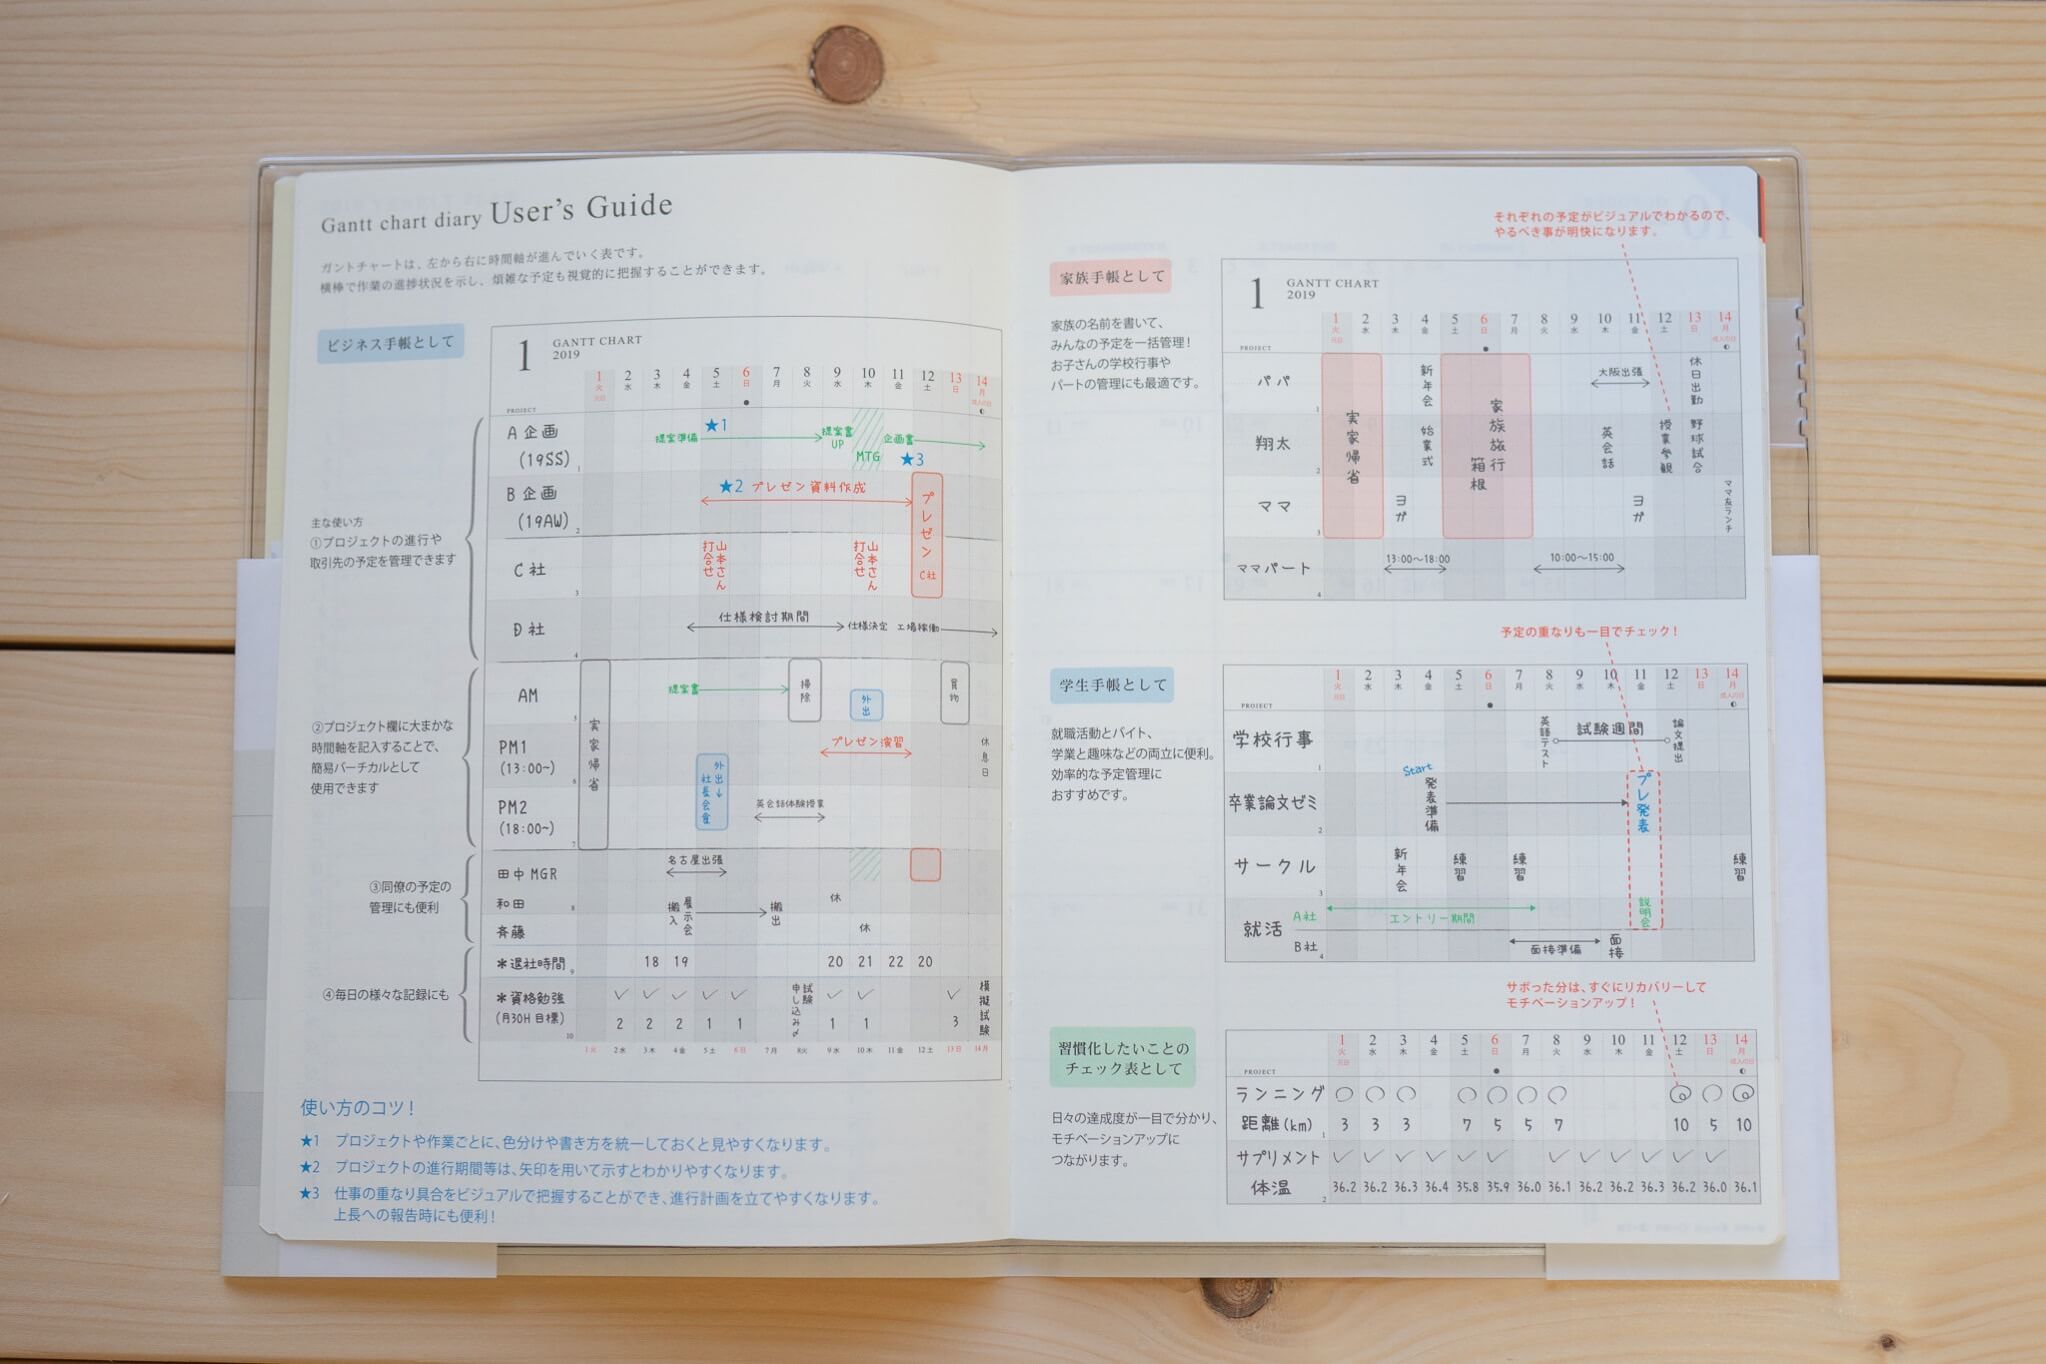 180828 gantt chart diary 6